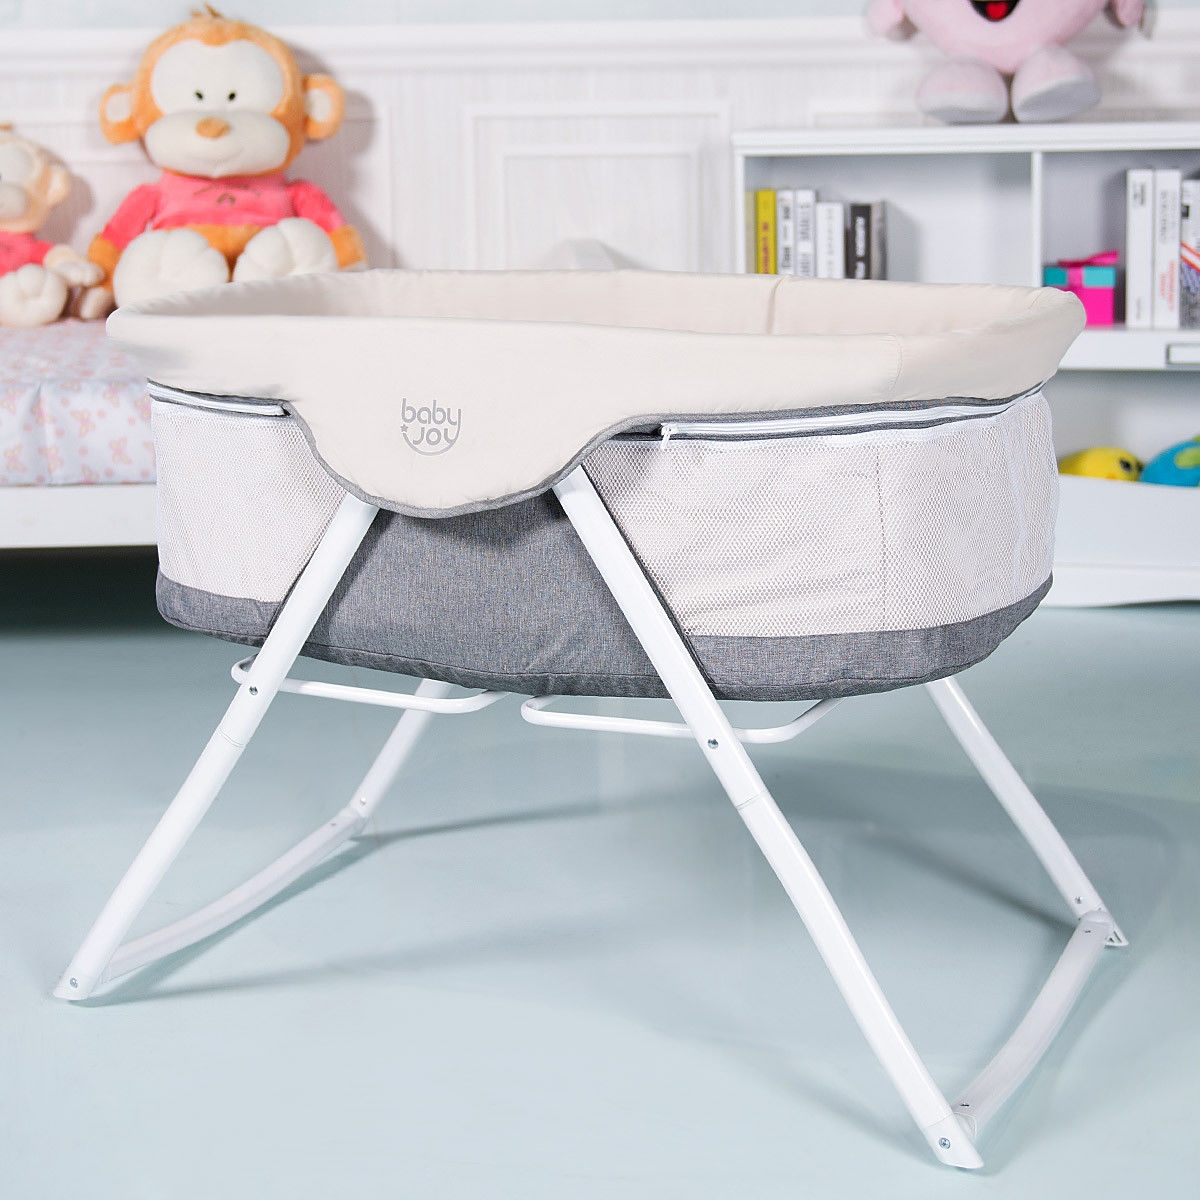 Portable Newborn Rocking Foldaway Baby Bassinet Crib